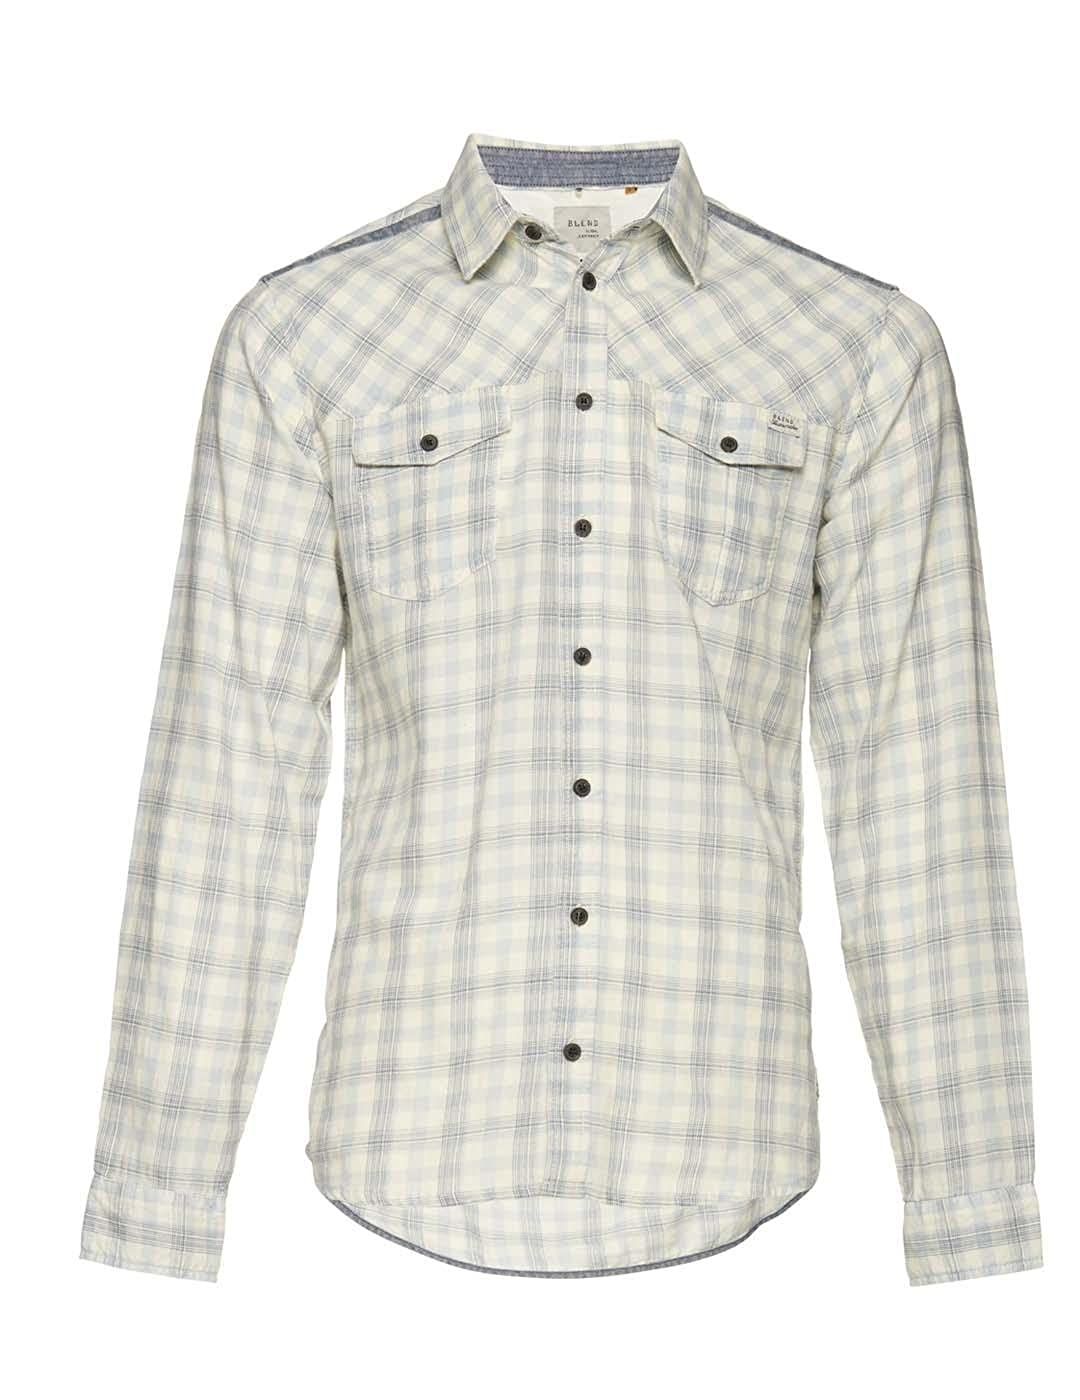 TALLA L. Blend Camisa de Cuadros Blanco